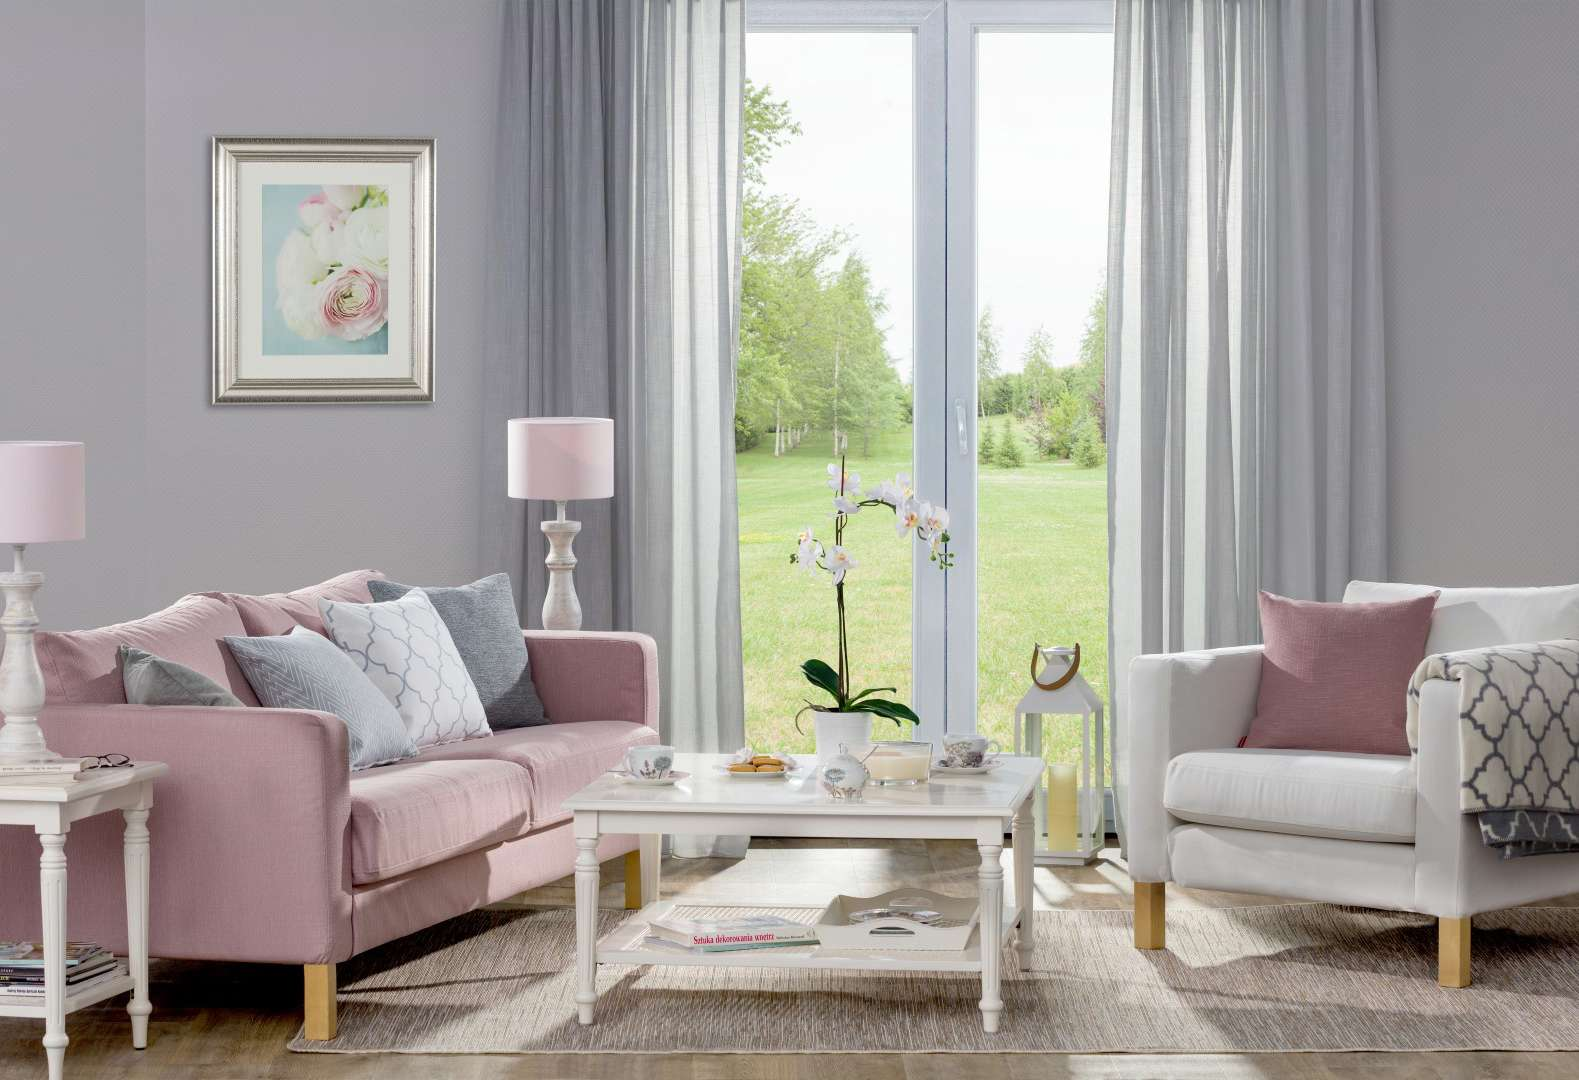 woonkamer in zachte pastel- en grijstinten